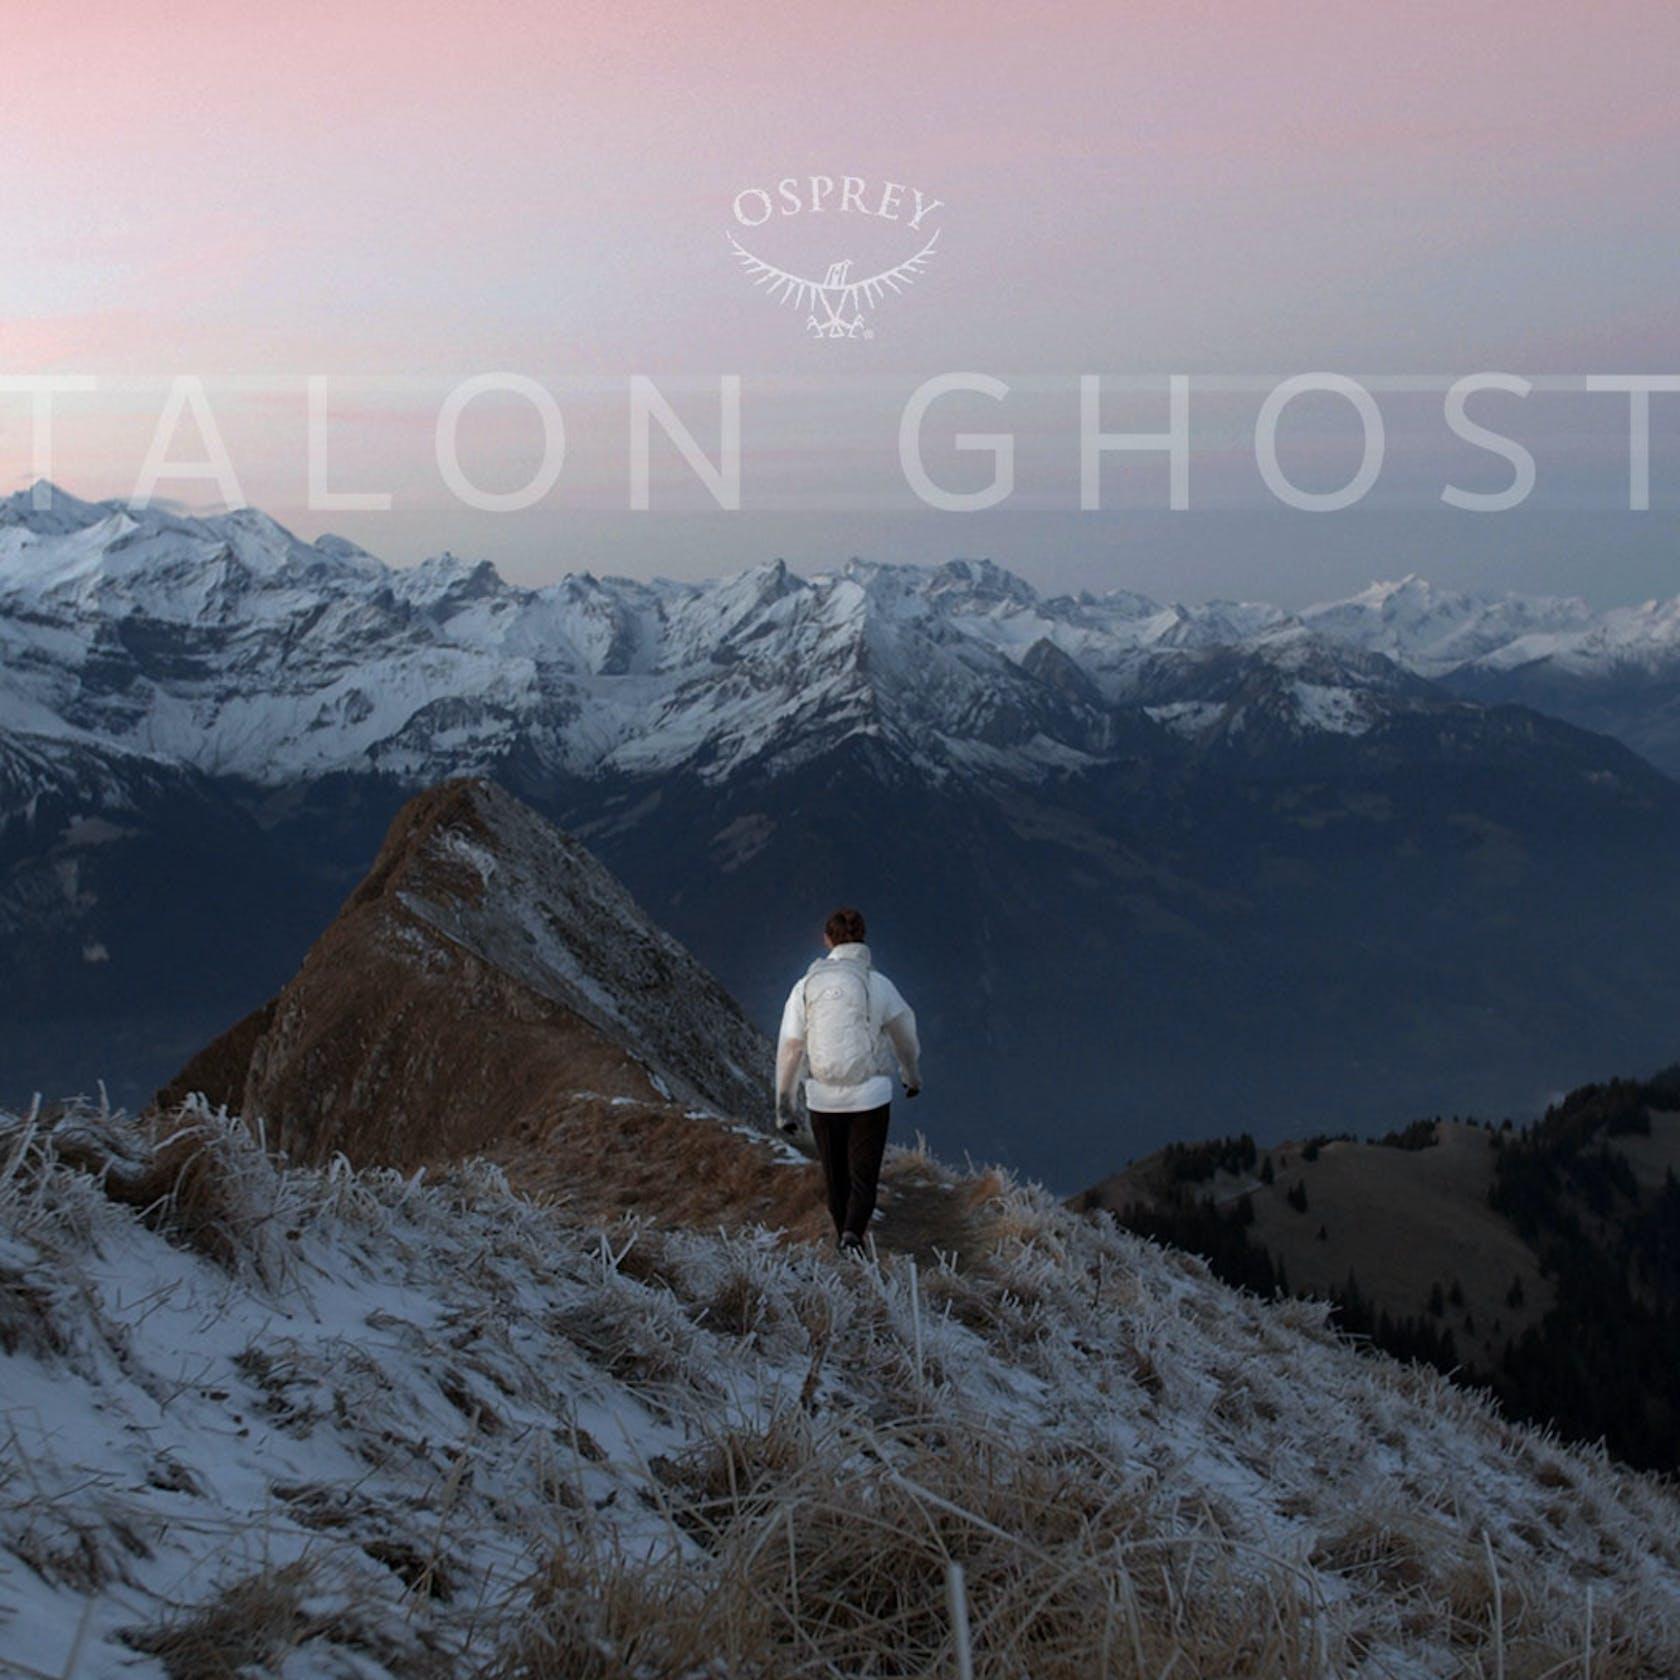 Talon Ghost Osprey